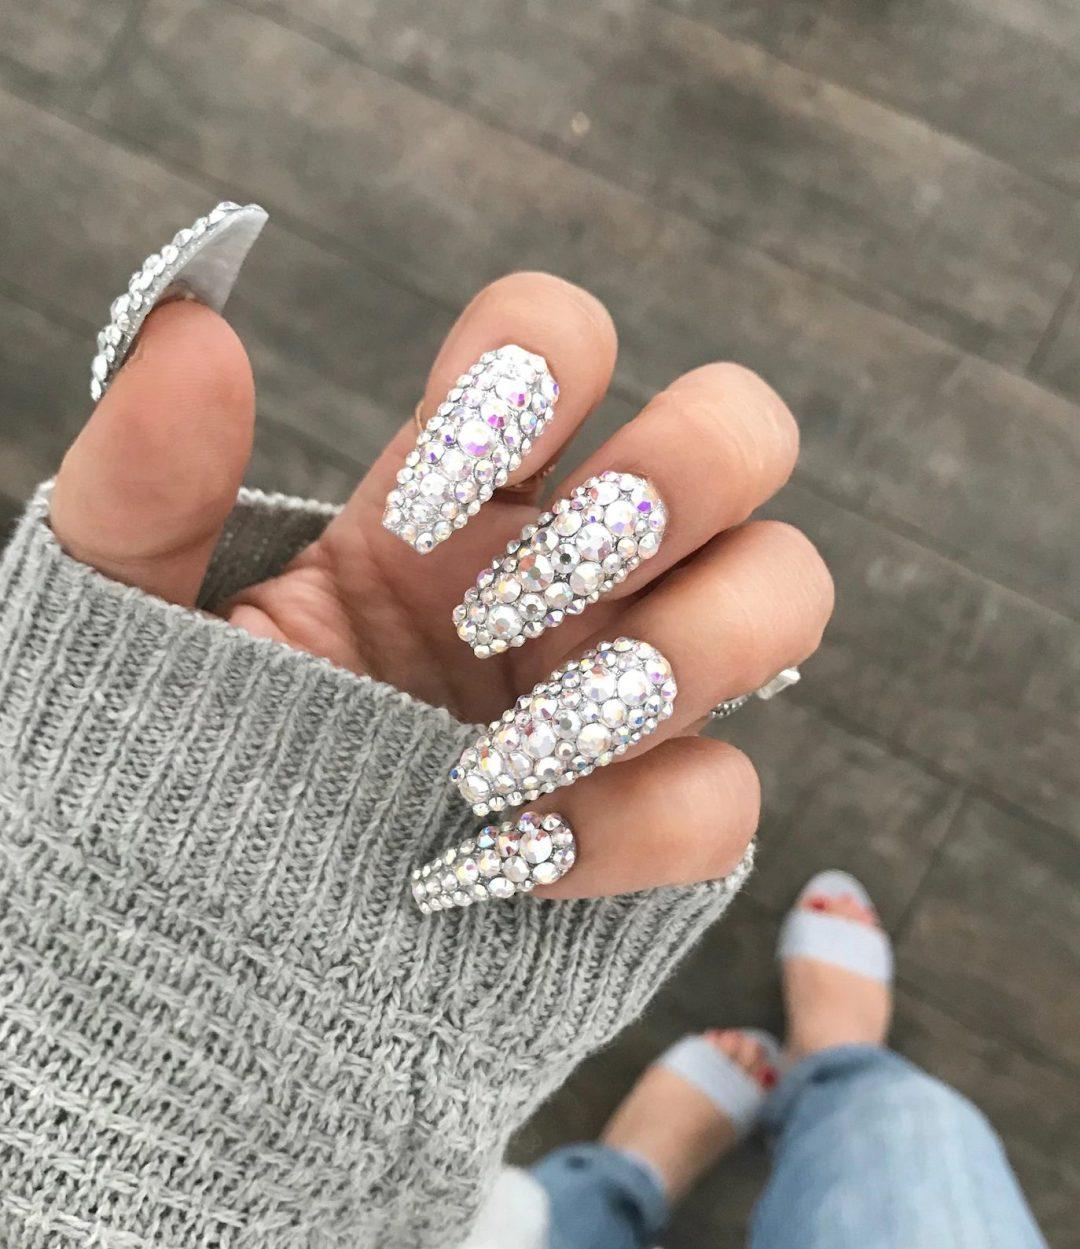 Cute silver rhinestone nails